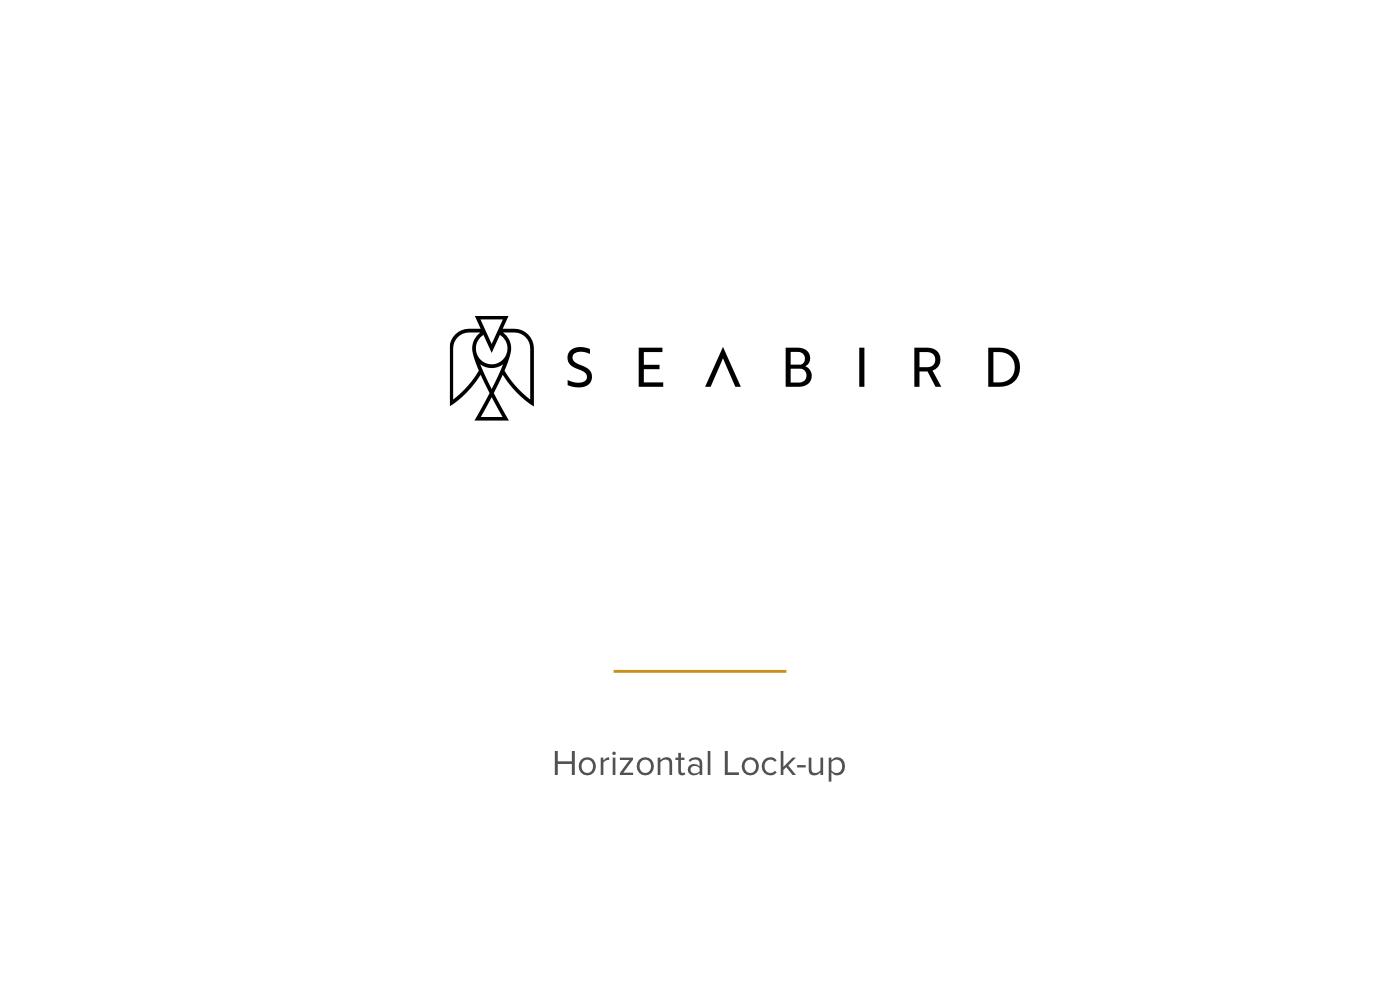 Seabird - LInear.png